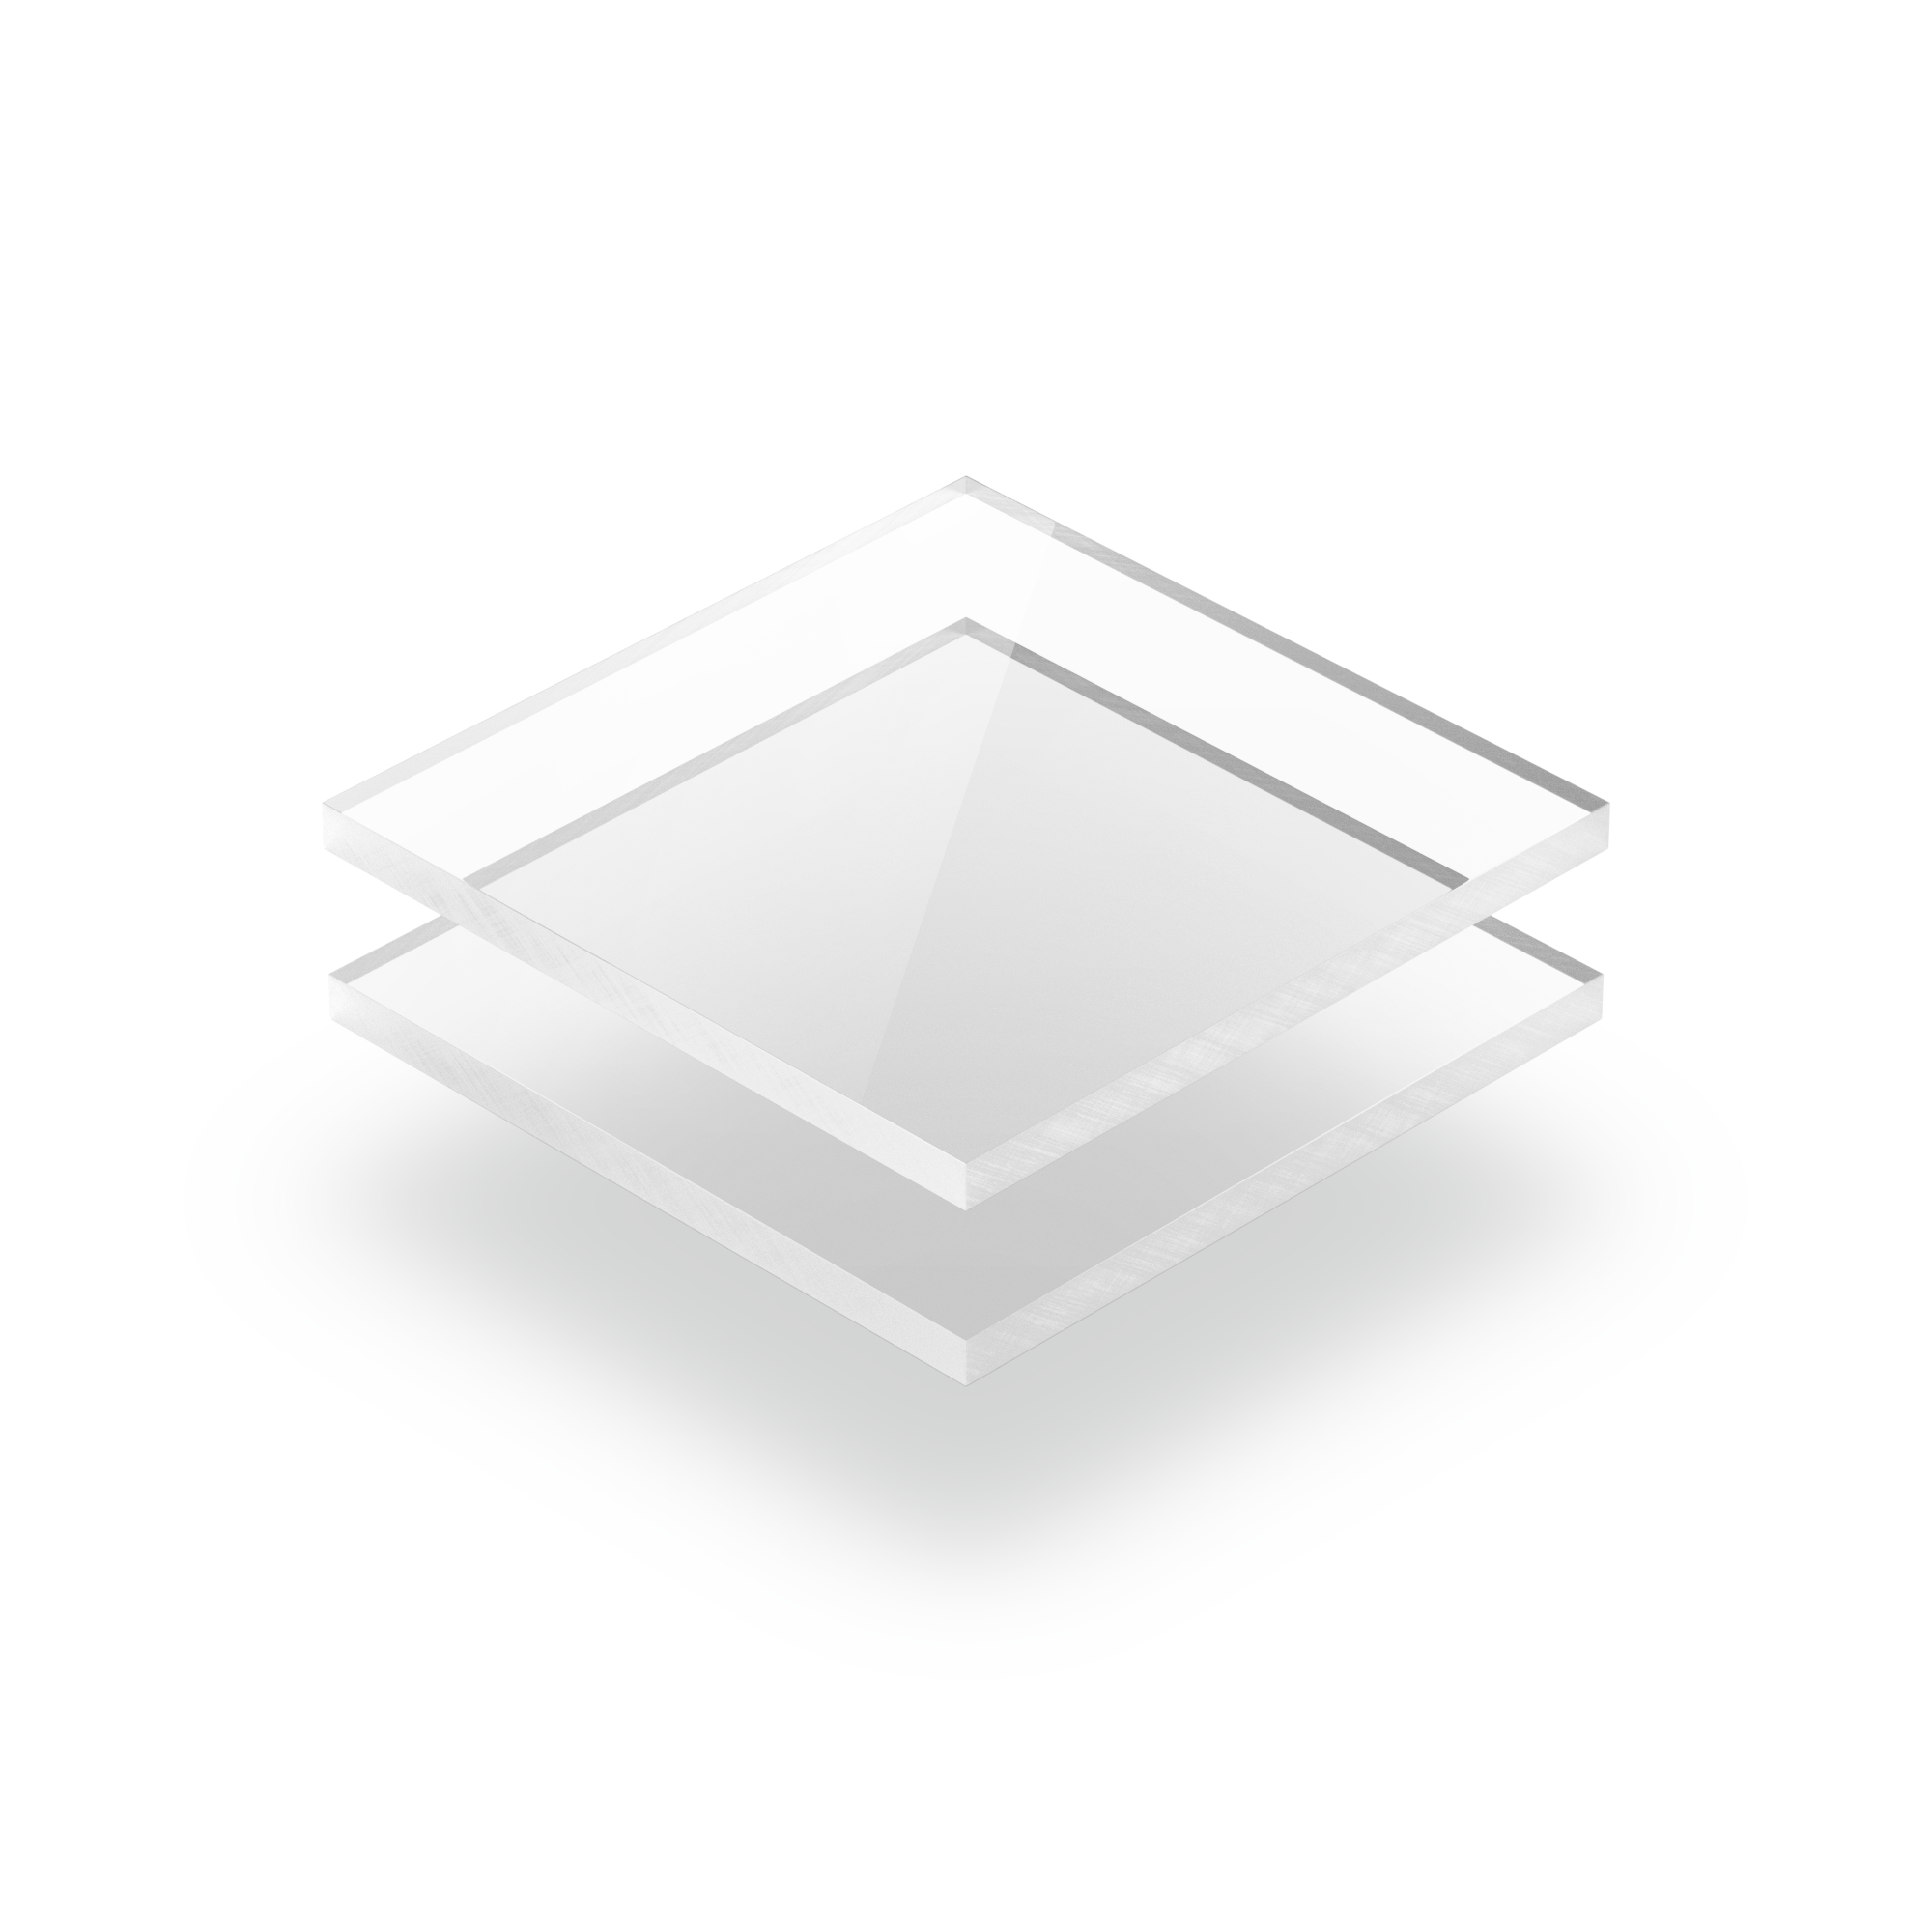 30 x 20 cm Acryl-Zuschnitt//Plexiglas-Platte transparent 3mm XT